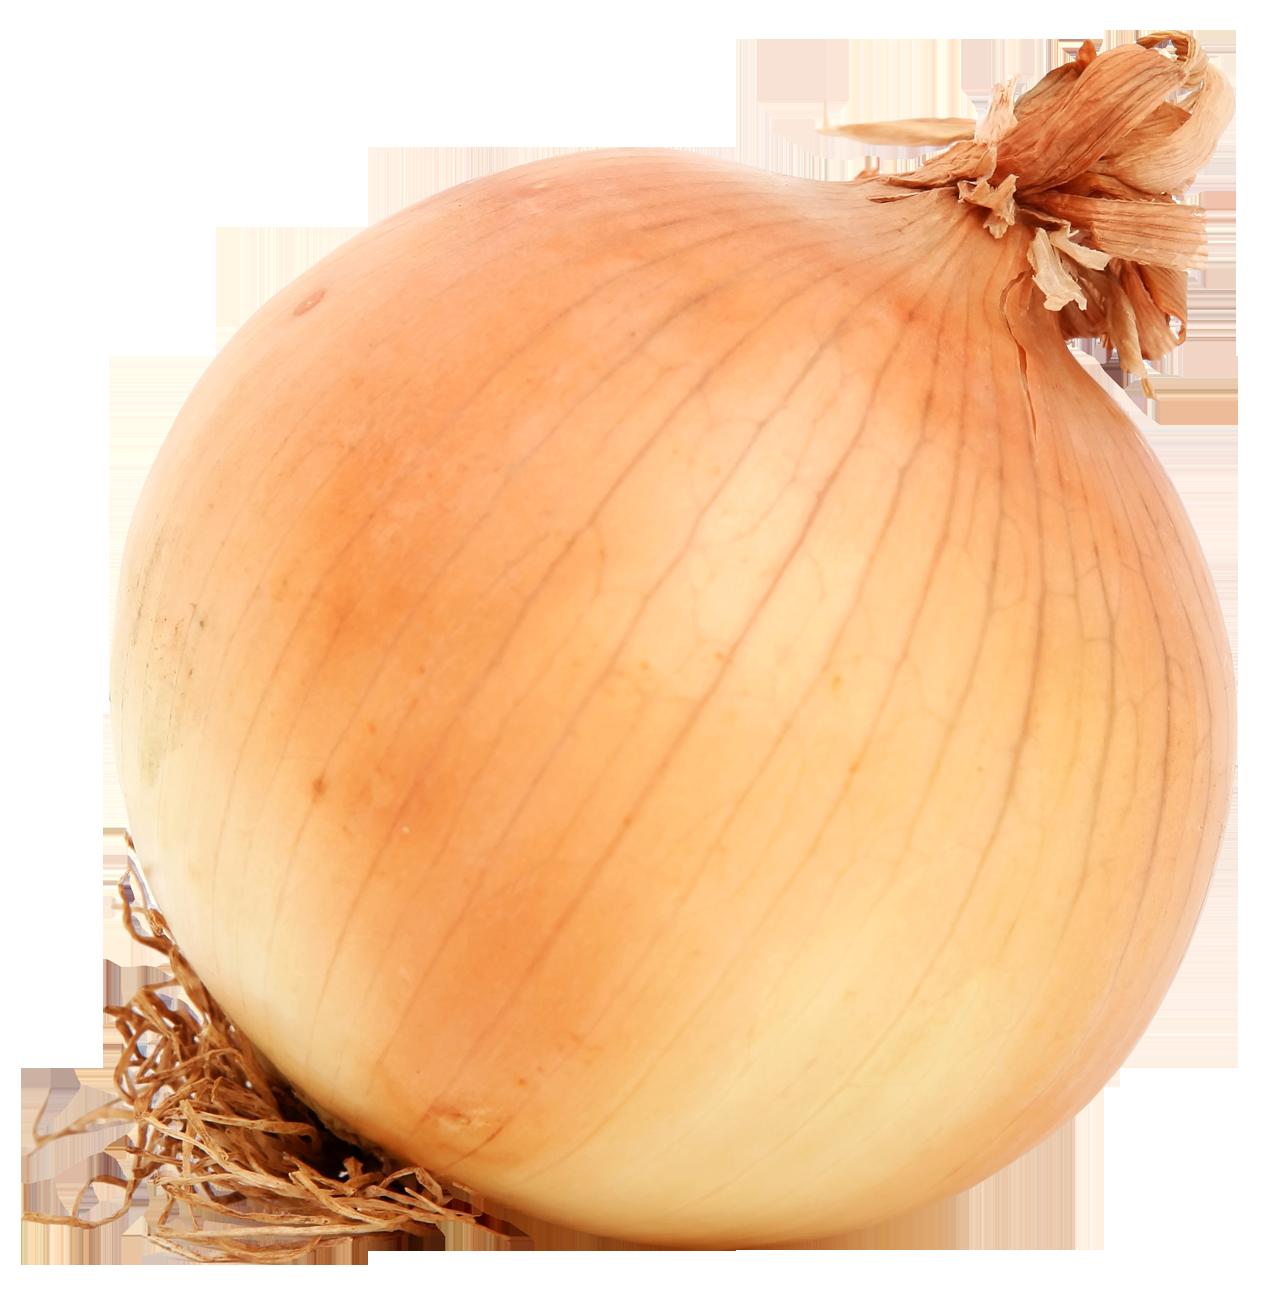 Onion clipart onion peel. Png images pngpix brown